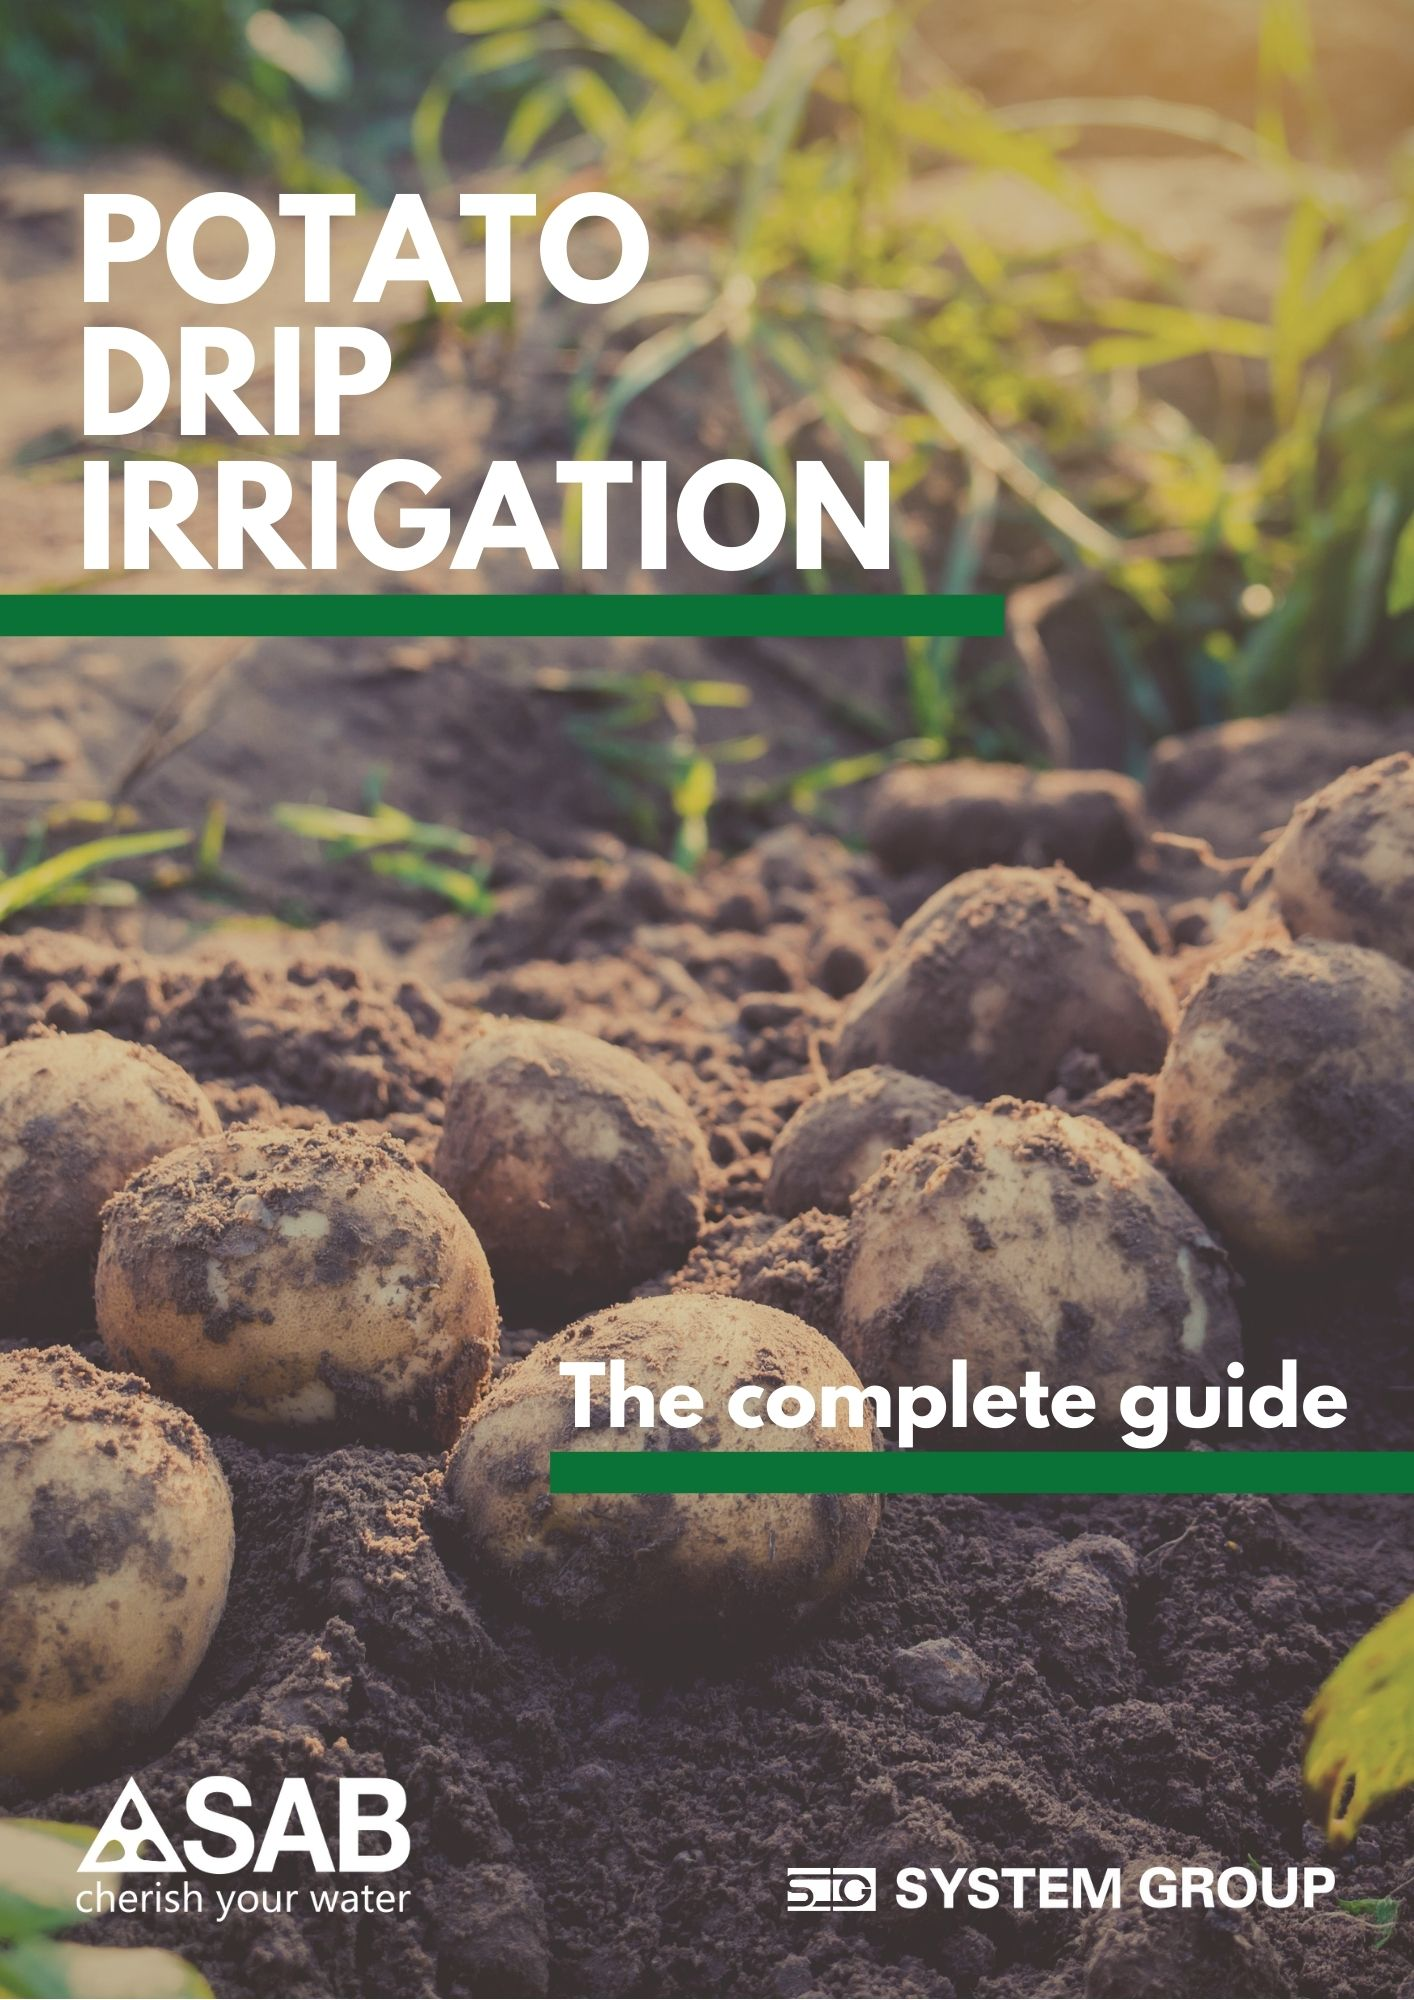 potato drip irrigation